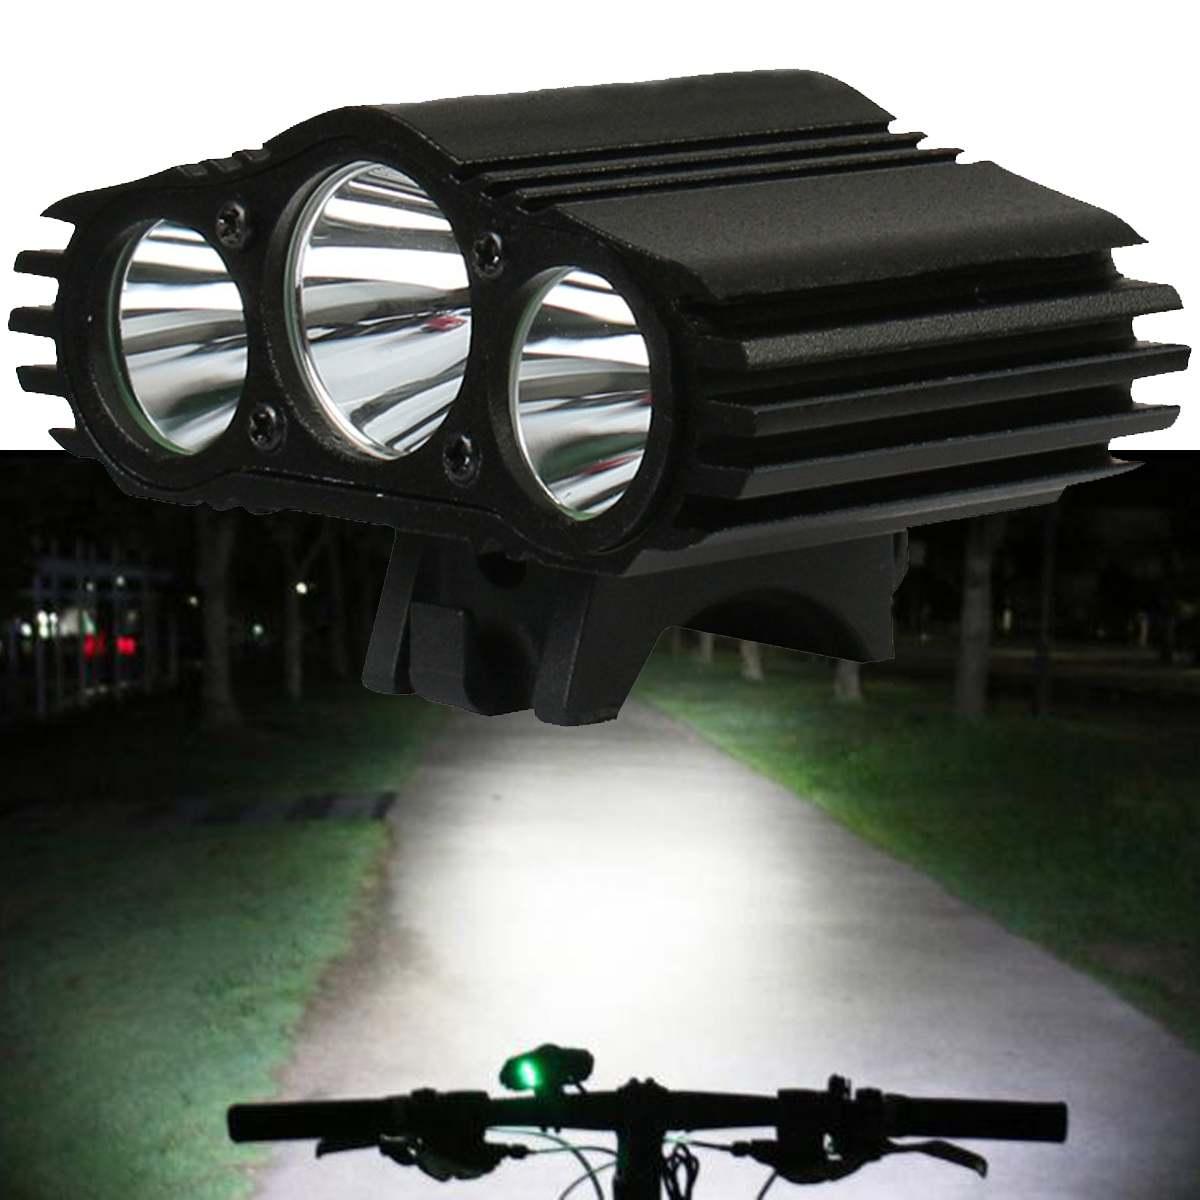 XANES 2700LM faro delantero de ciclismo 3xT6 LED 4 modos IPX6 impermeable Luz de bicicleta faro Control de temperatura Pantalla de potencia No